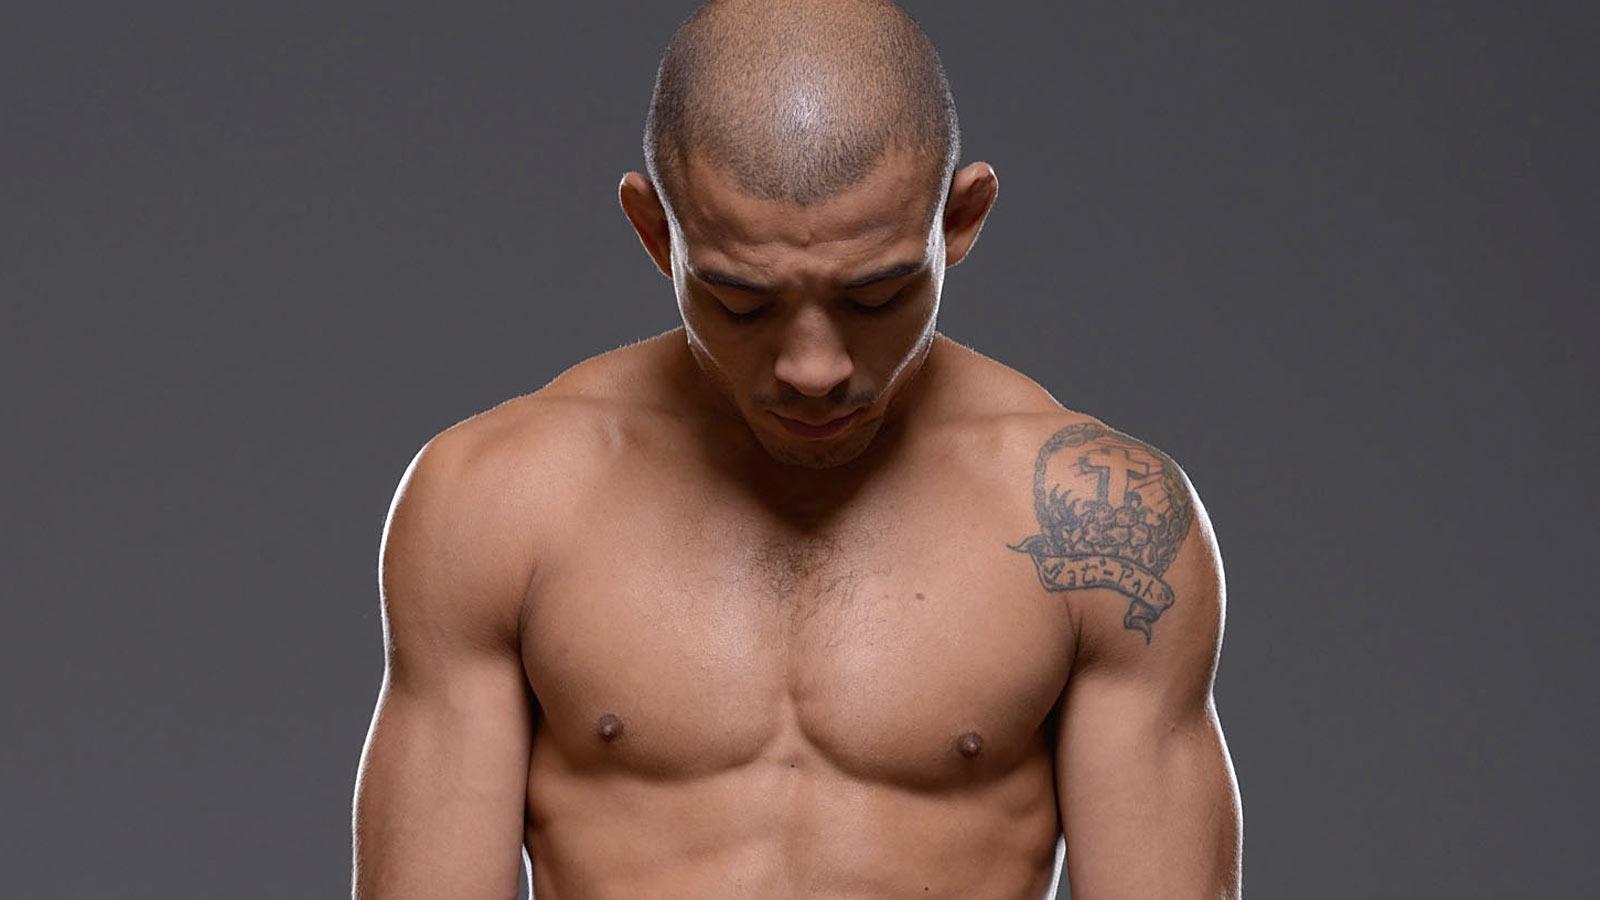 020514-ufc-featherweight-champion-jose-aldo-pi-.jpg